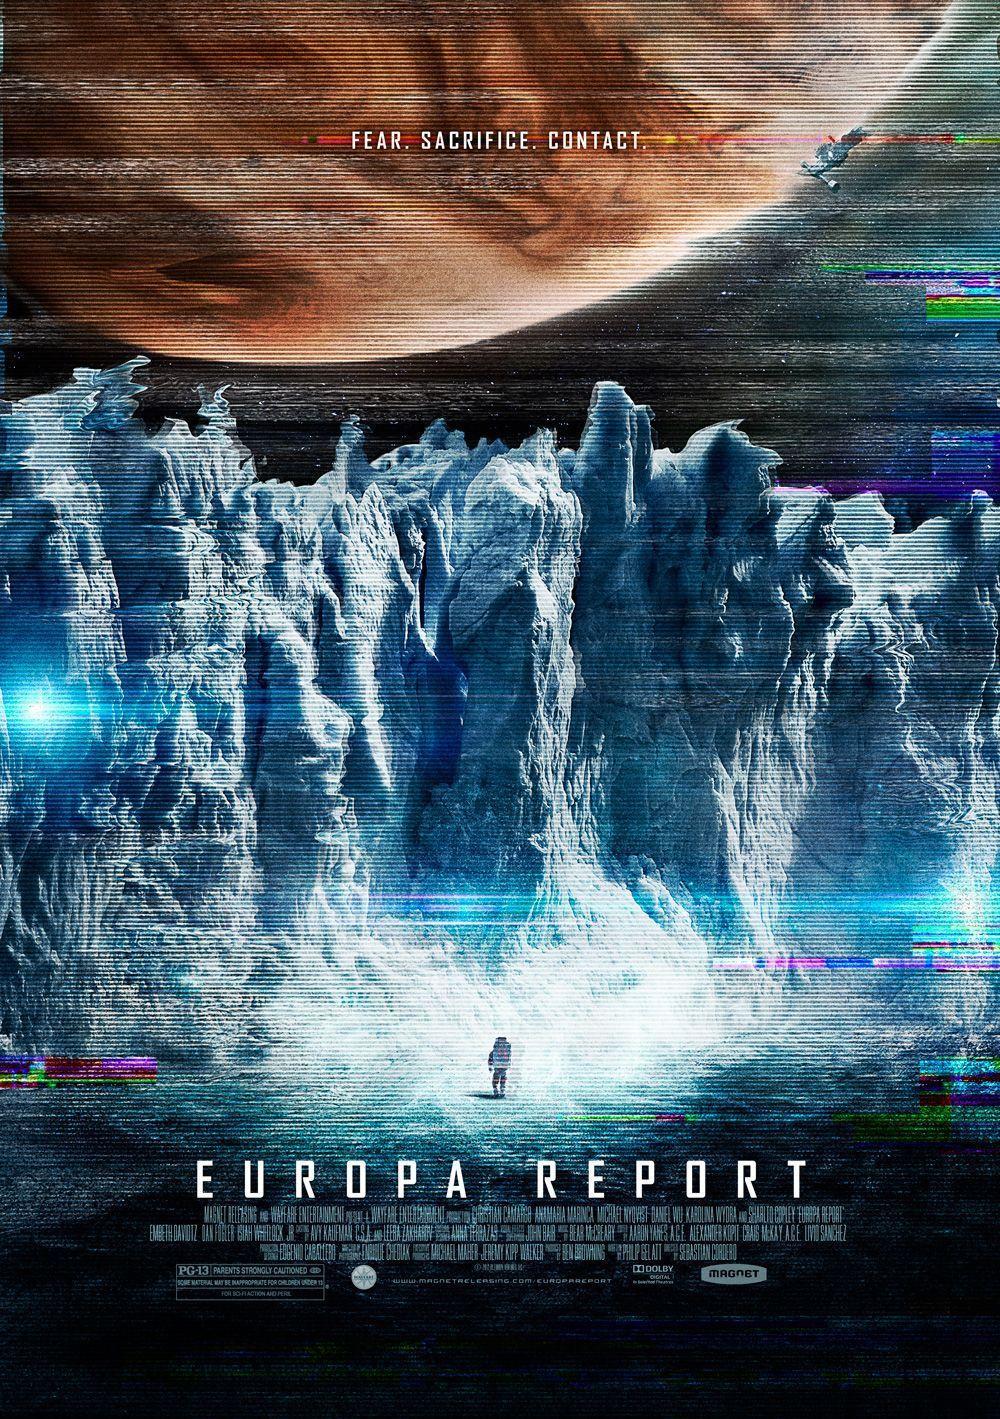 Europa Report - Film (2013)